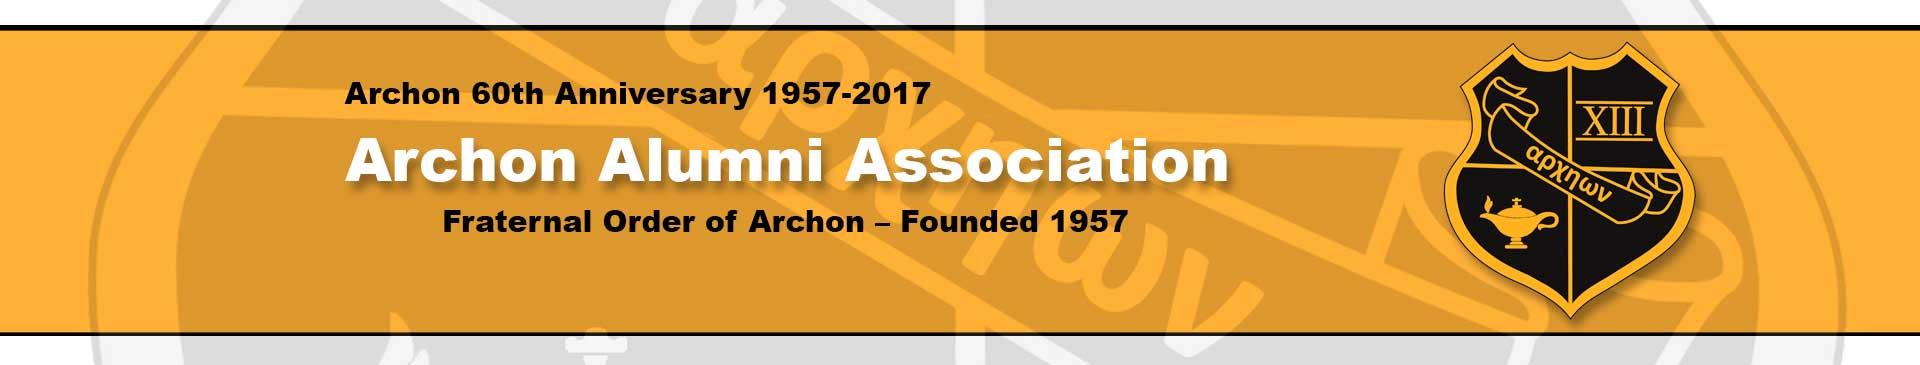 Achon Alumni Association